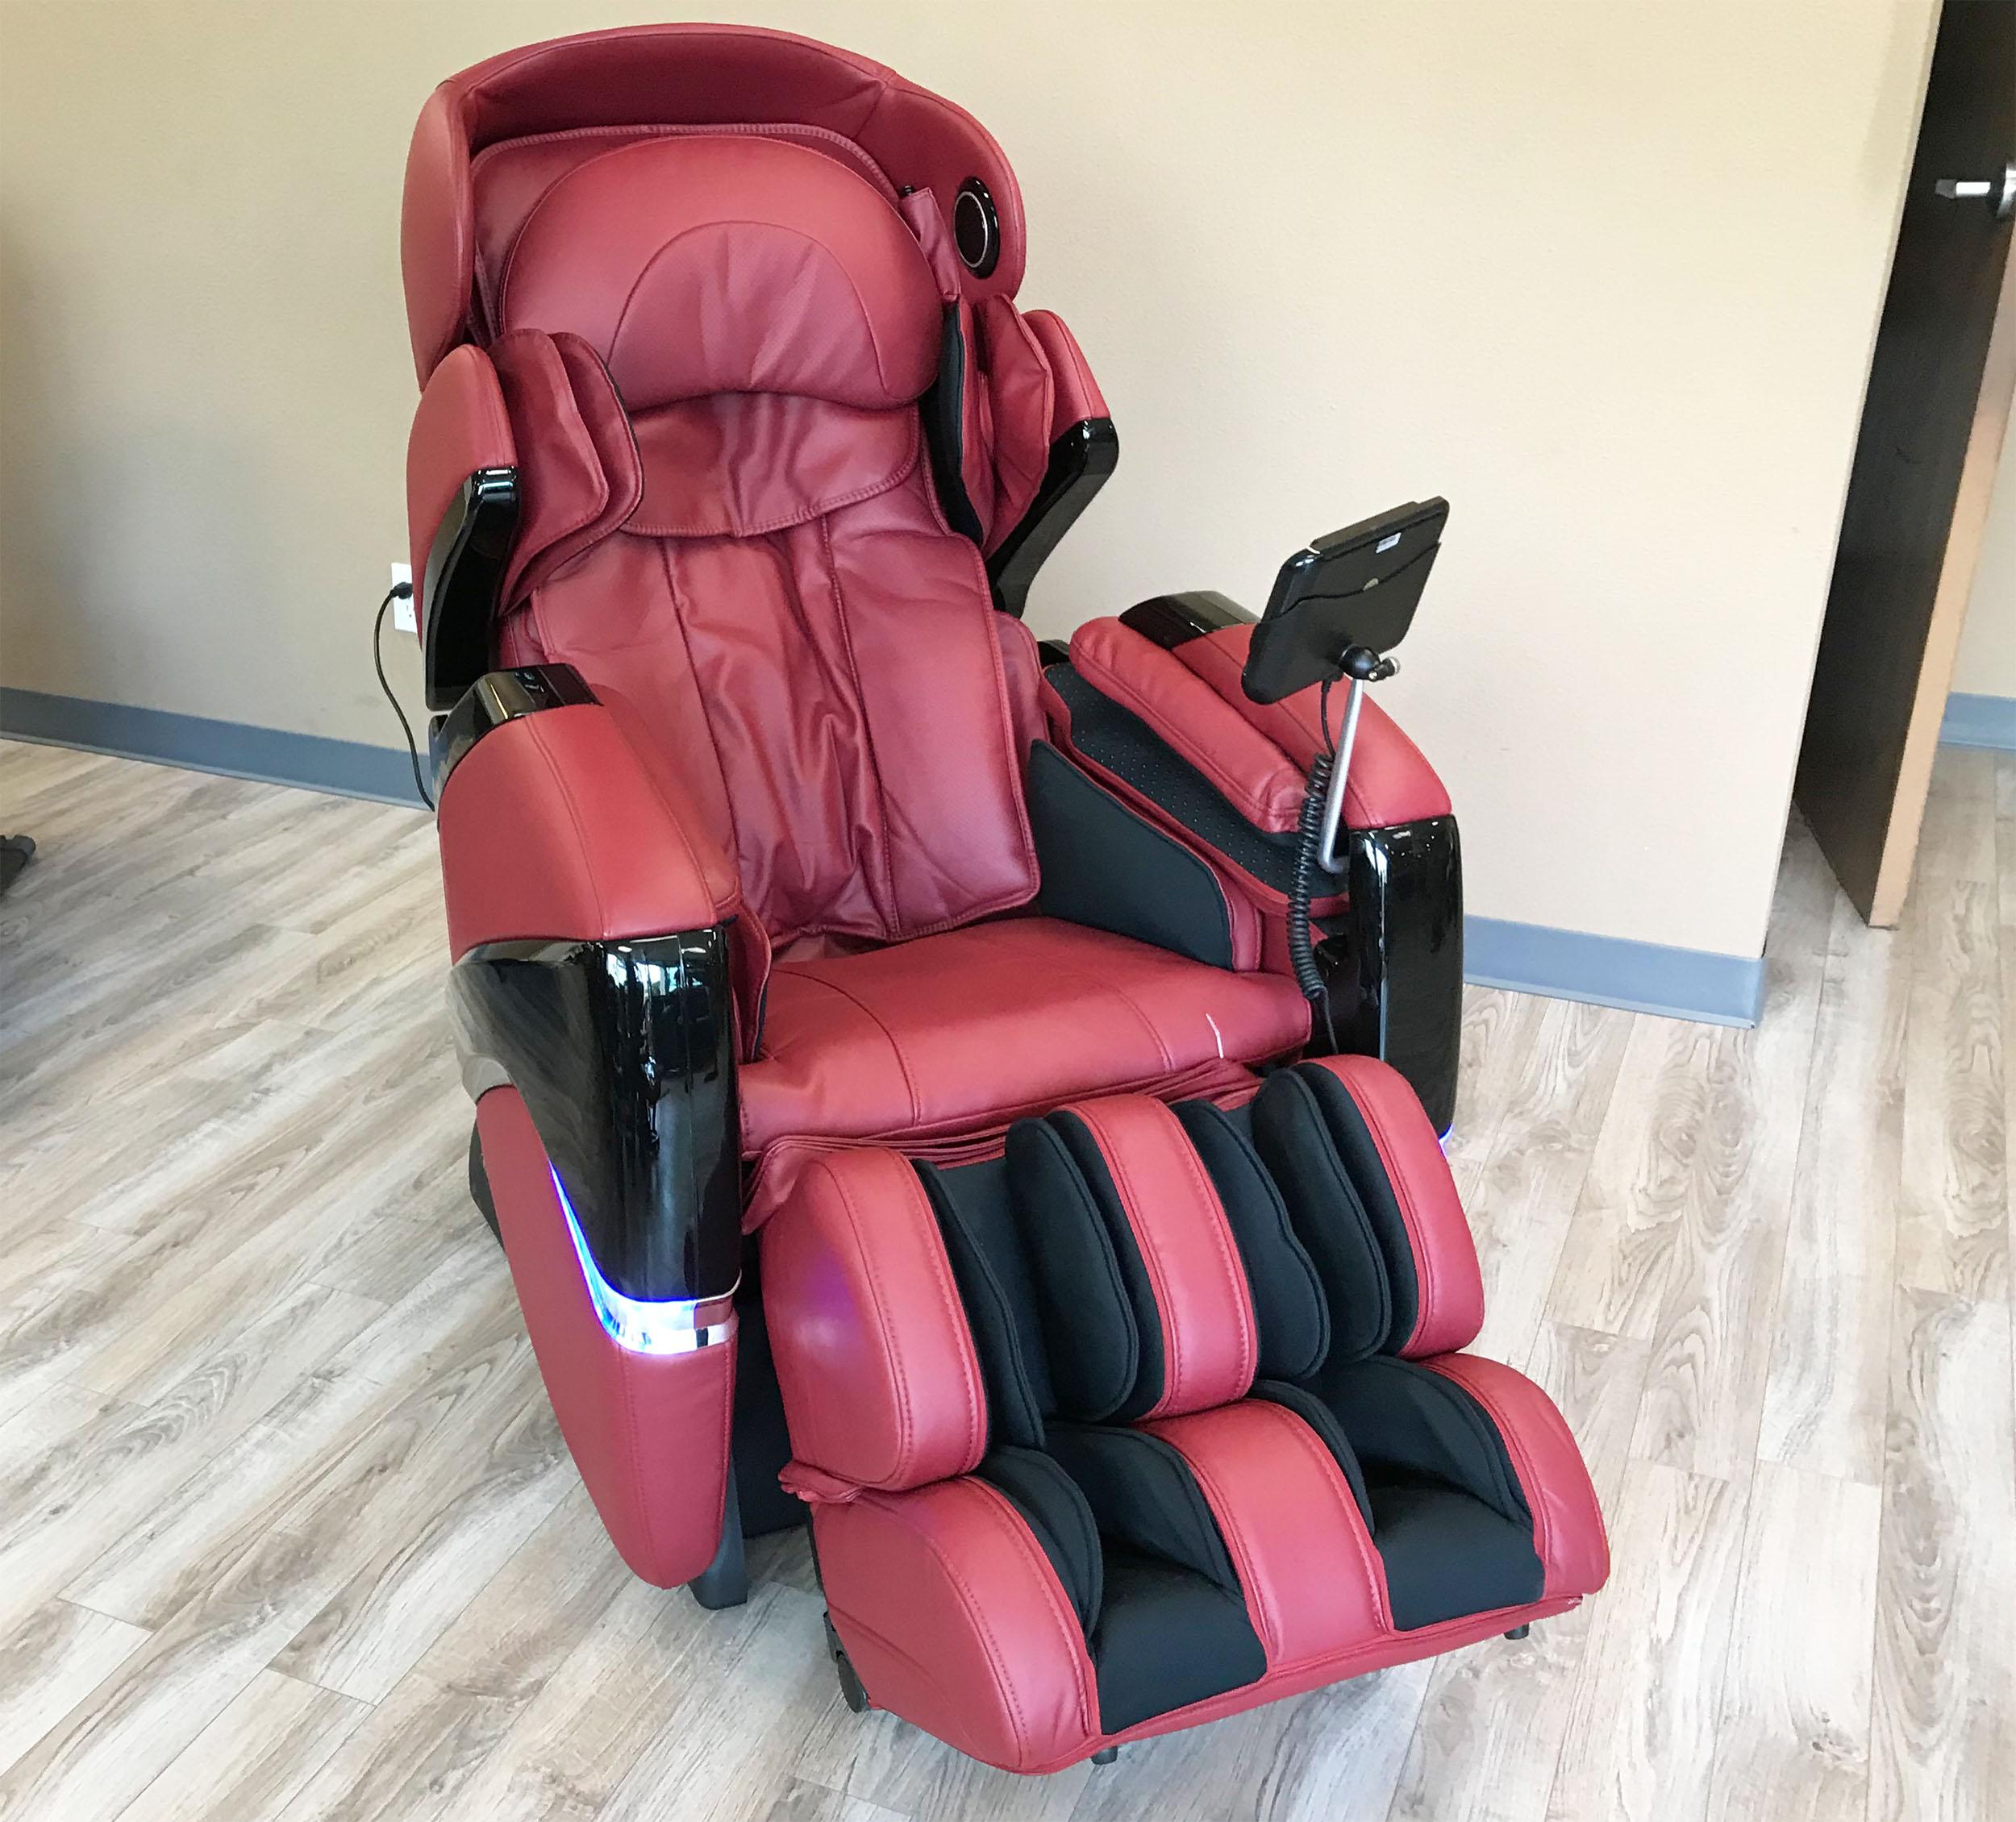 osaki os 3d pro cyber massage chair wicker swing zero gravity recliner and